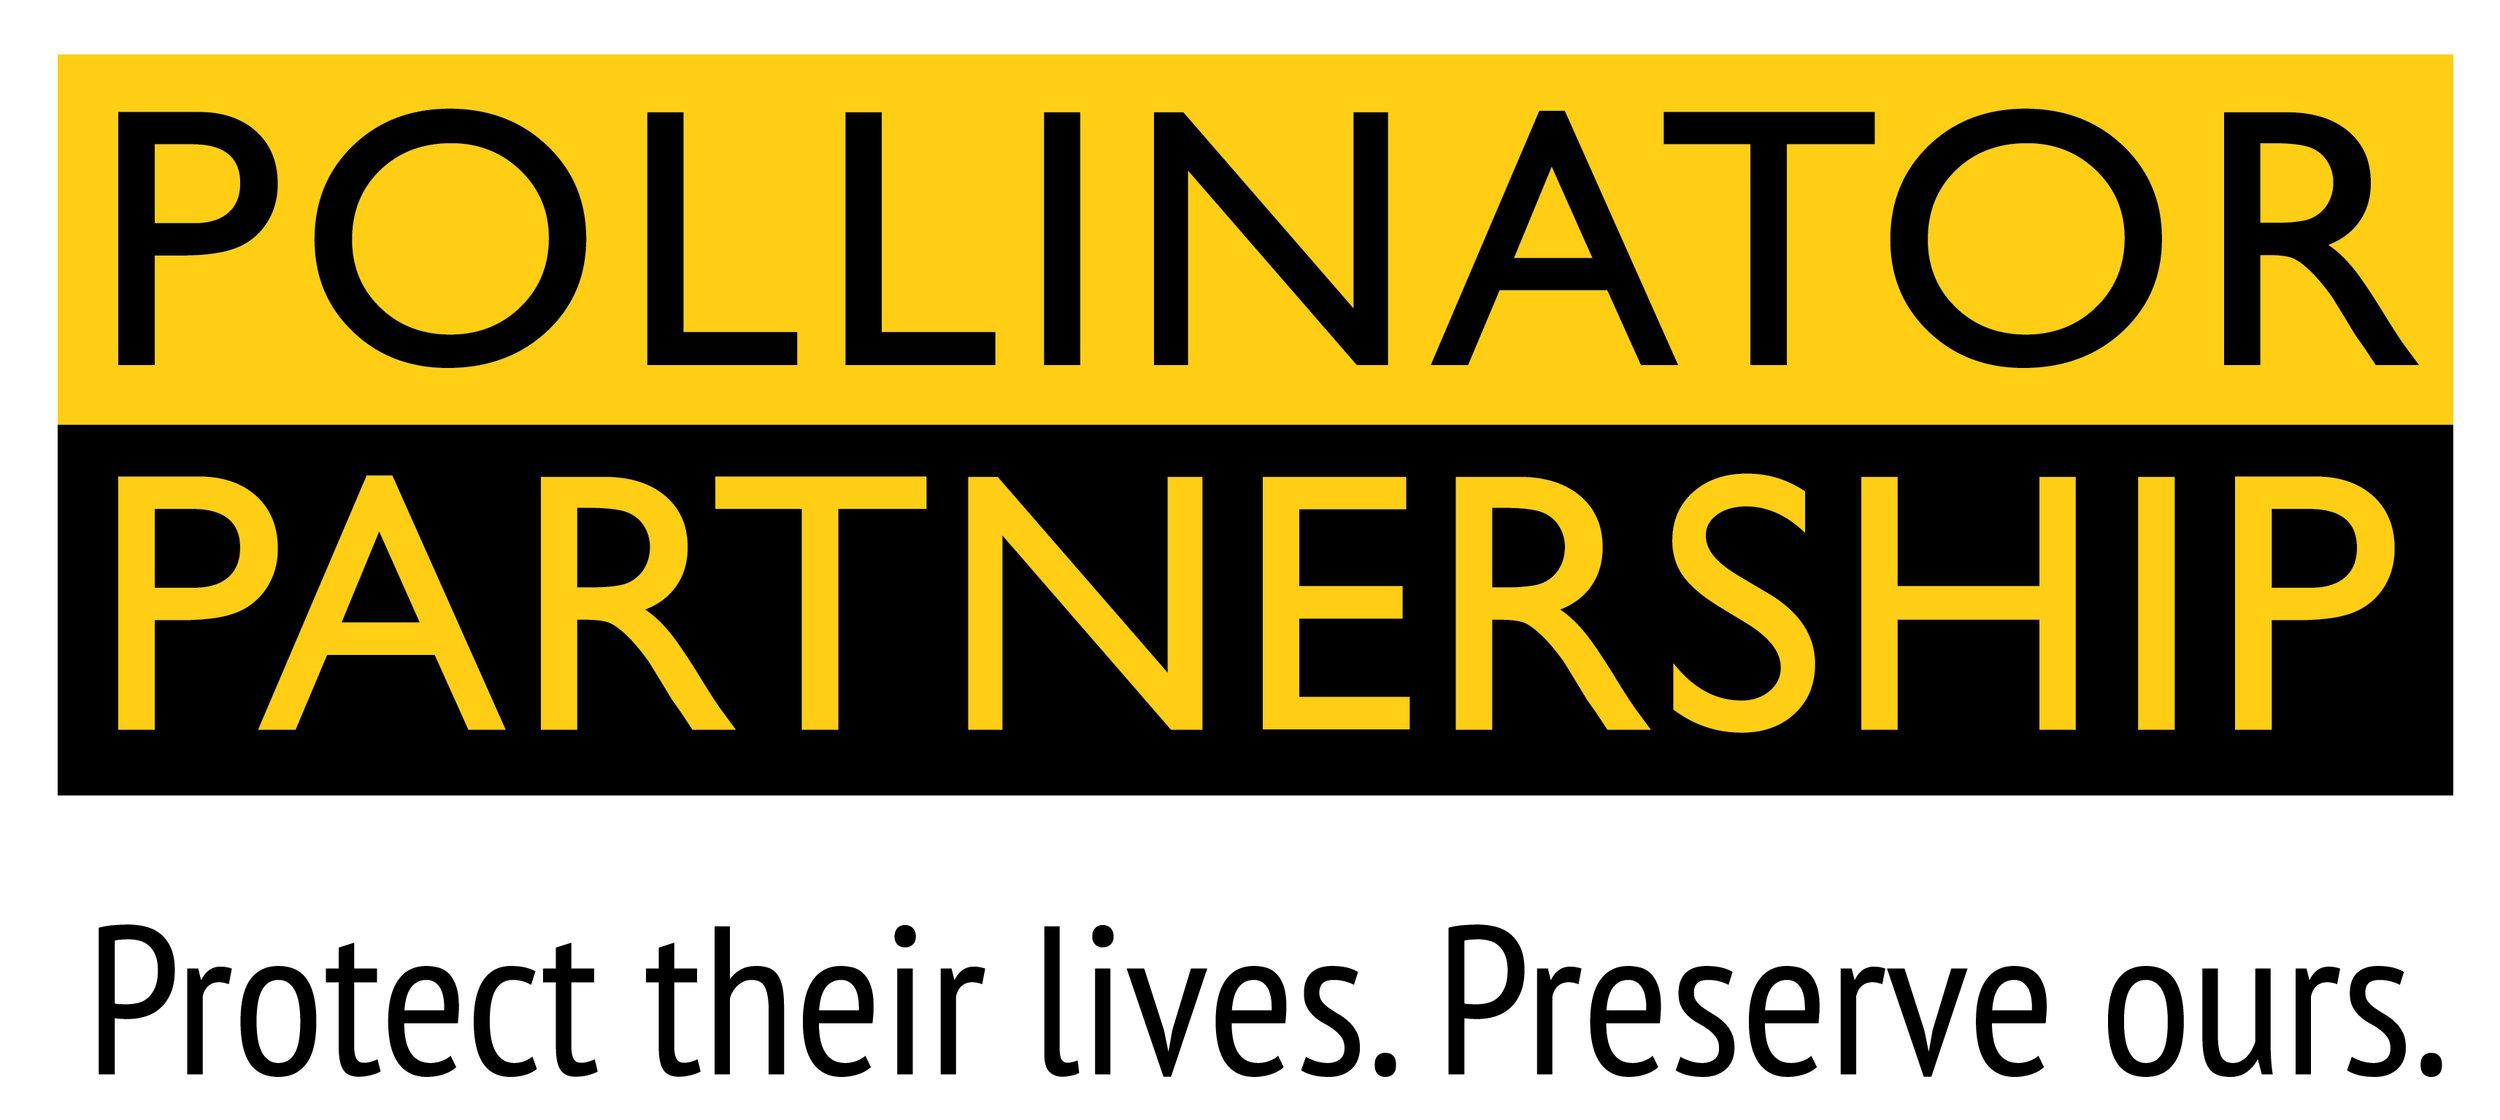 Pollinator-Partnership logo.jpg